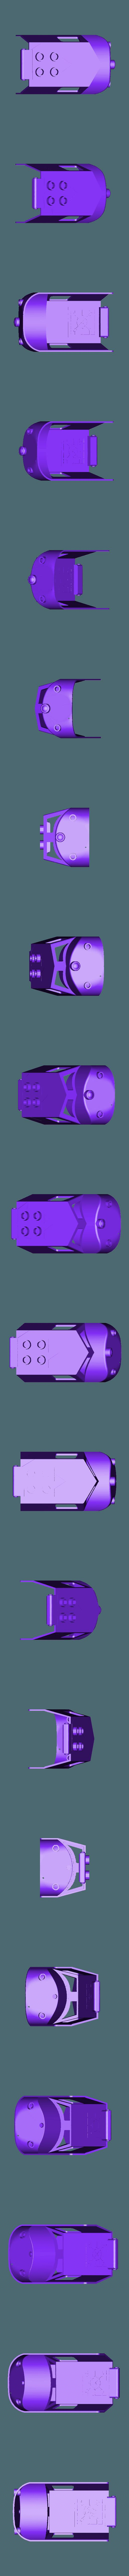 cabina_lego_modificada_1.stl Télécharger fichier STL gratuit Tren Lego Duplo Motorizado controlado por Infrarojos • Objet à imprimer en 3D, celtarra12